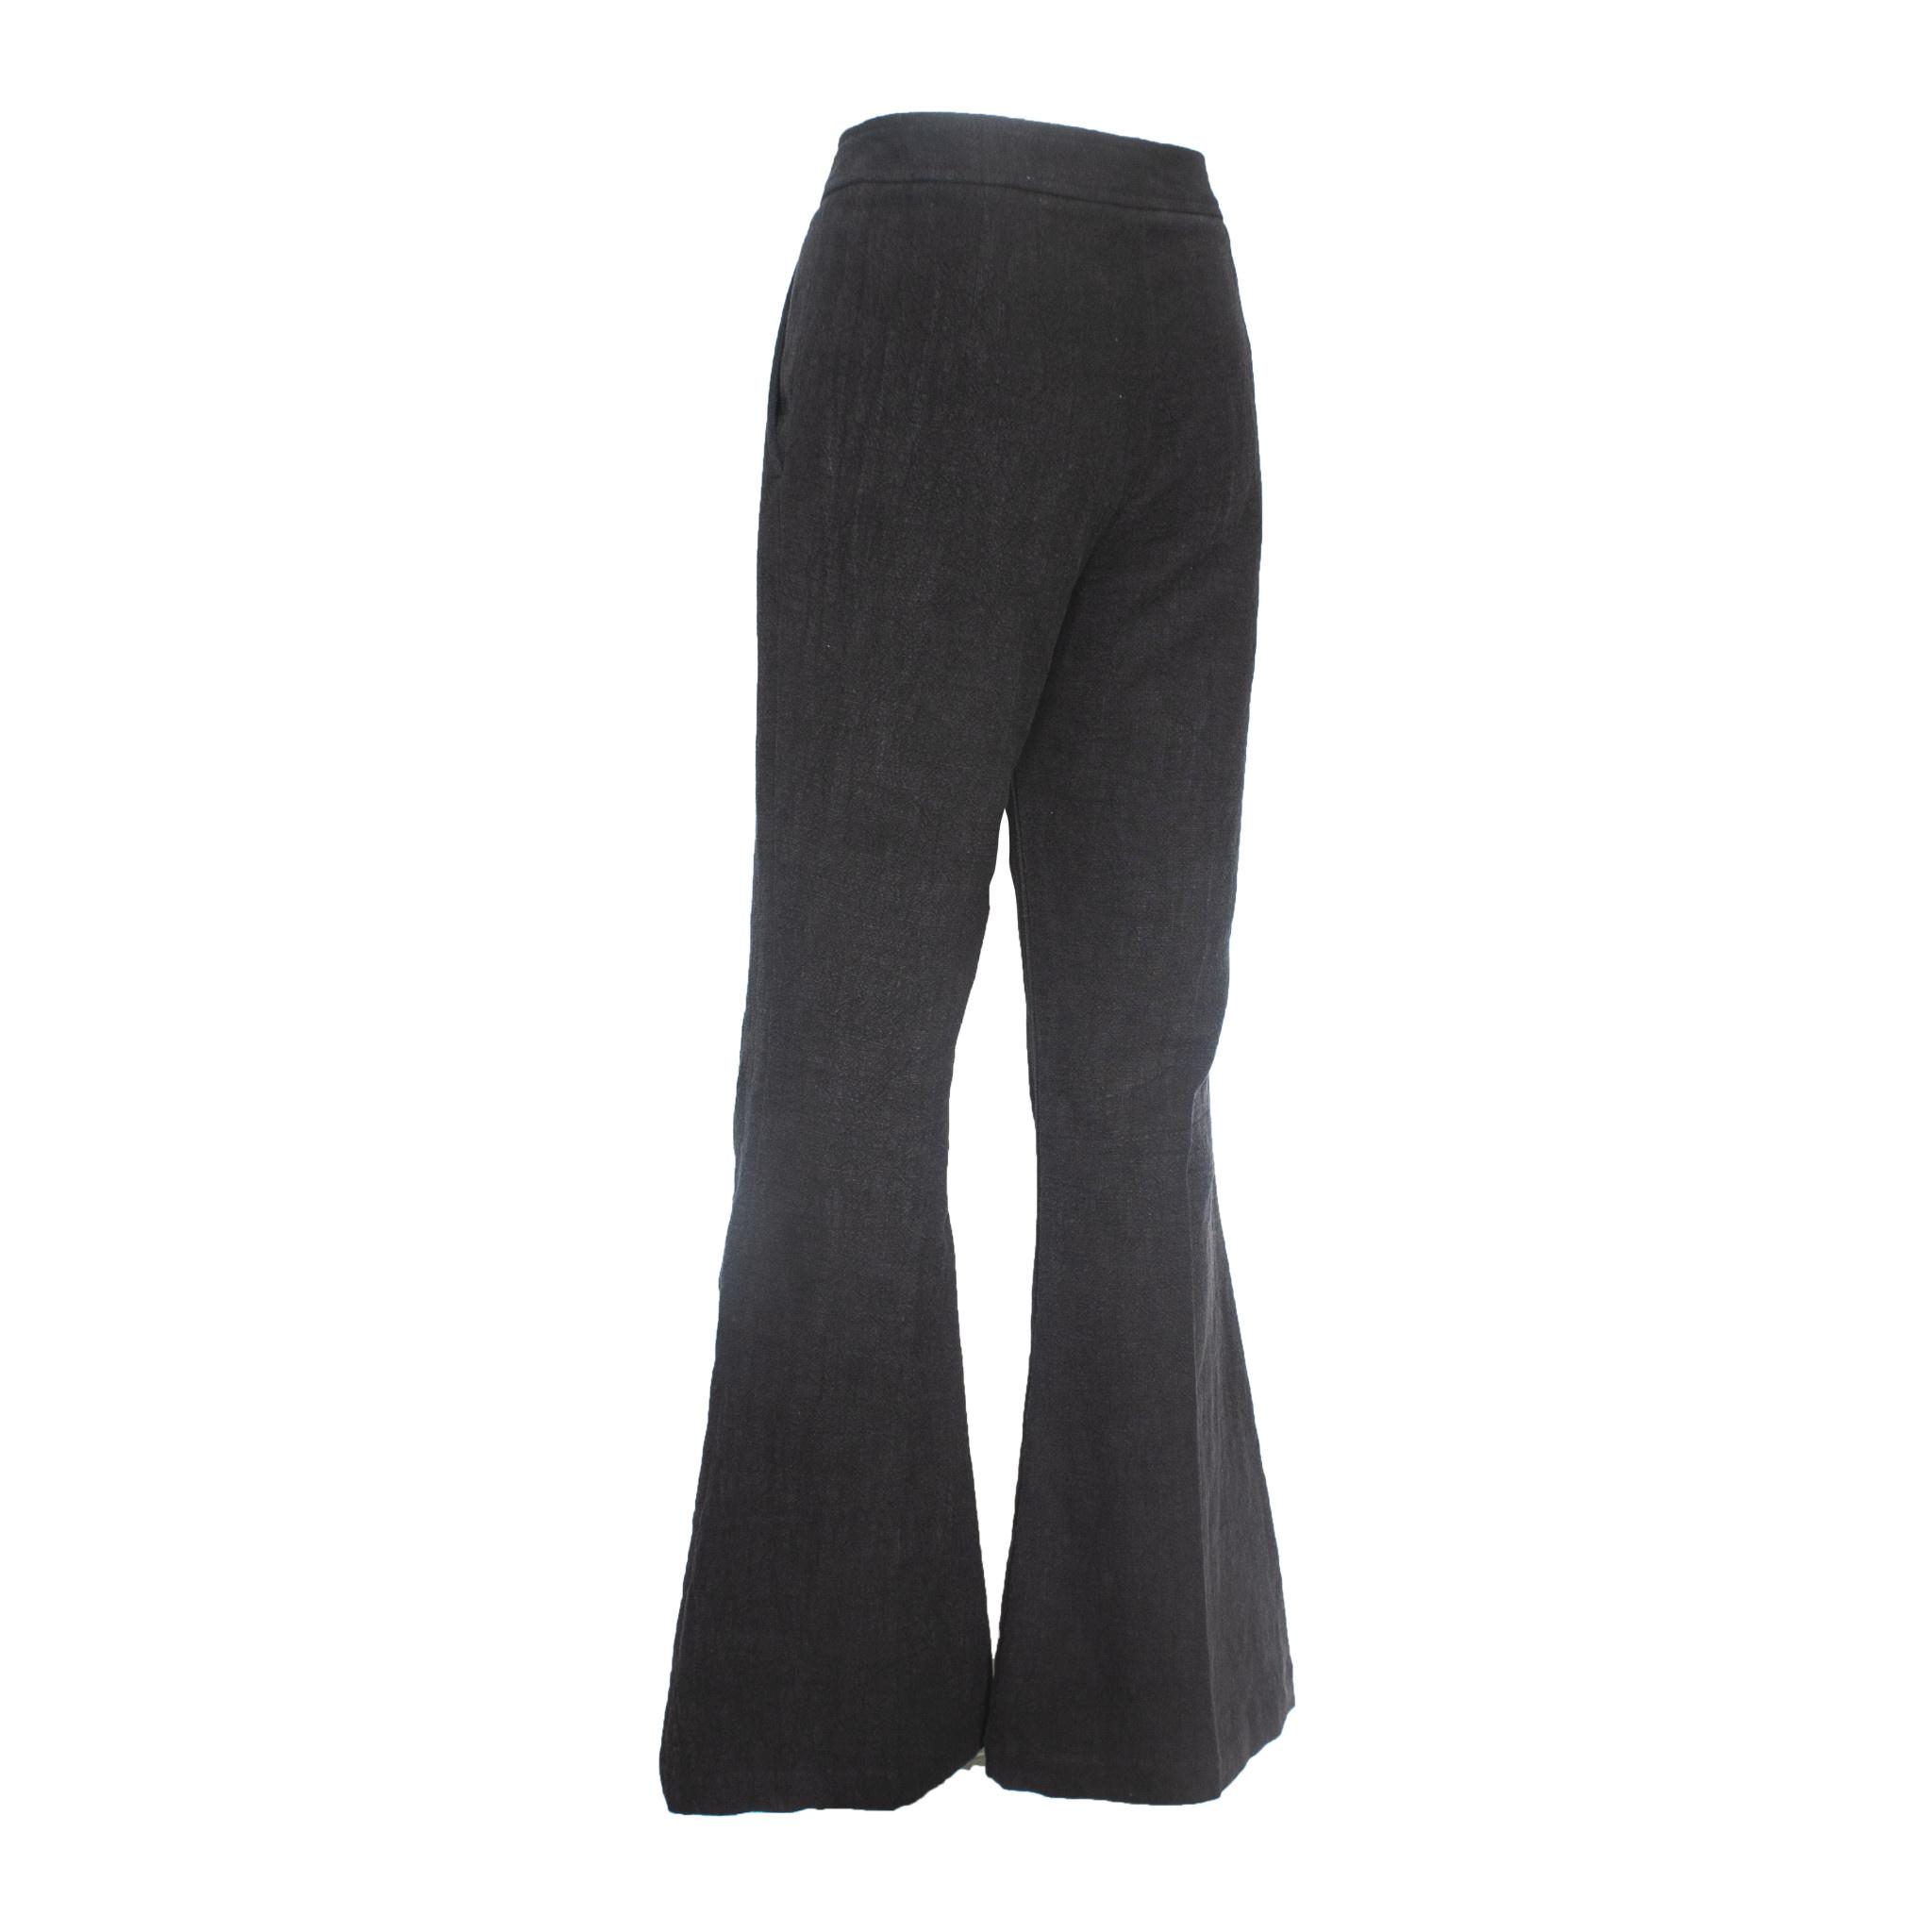 Xenia Xenia Grup Button Down Pants - Ash